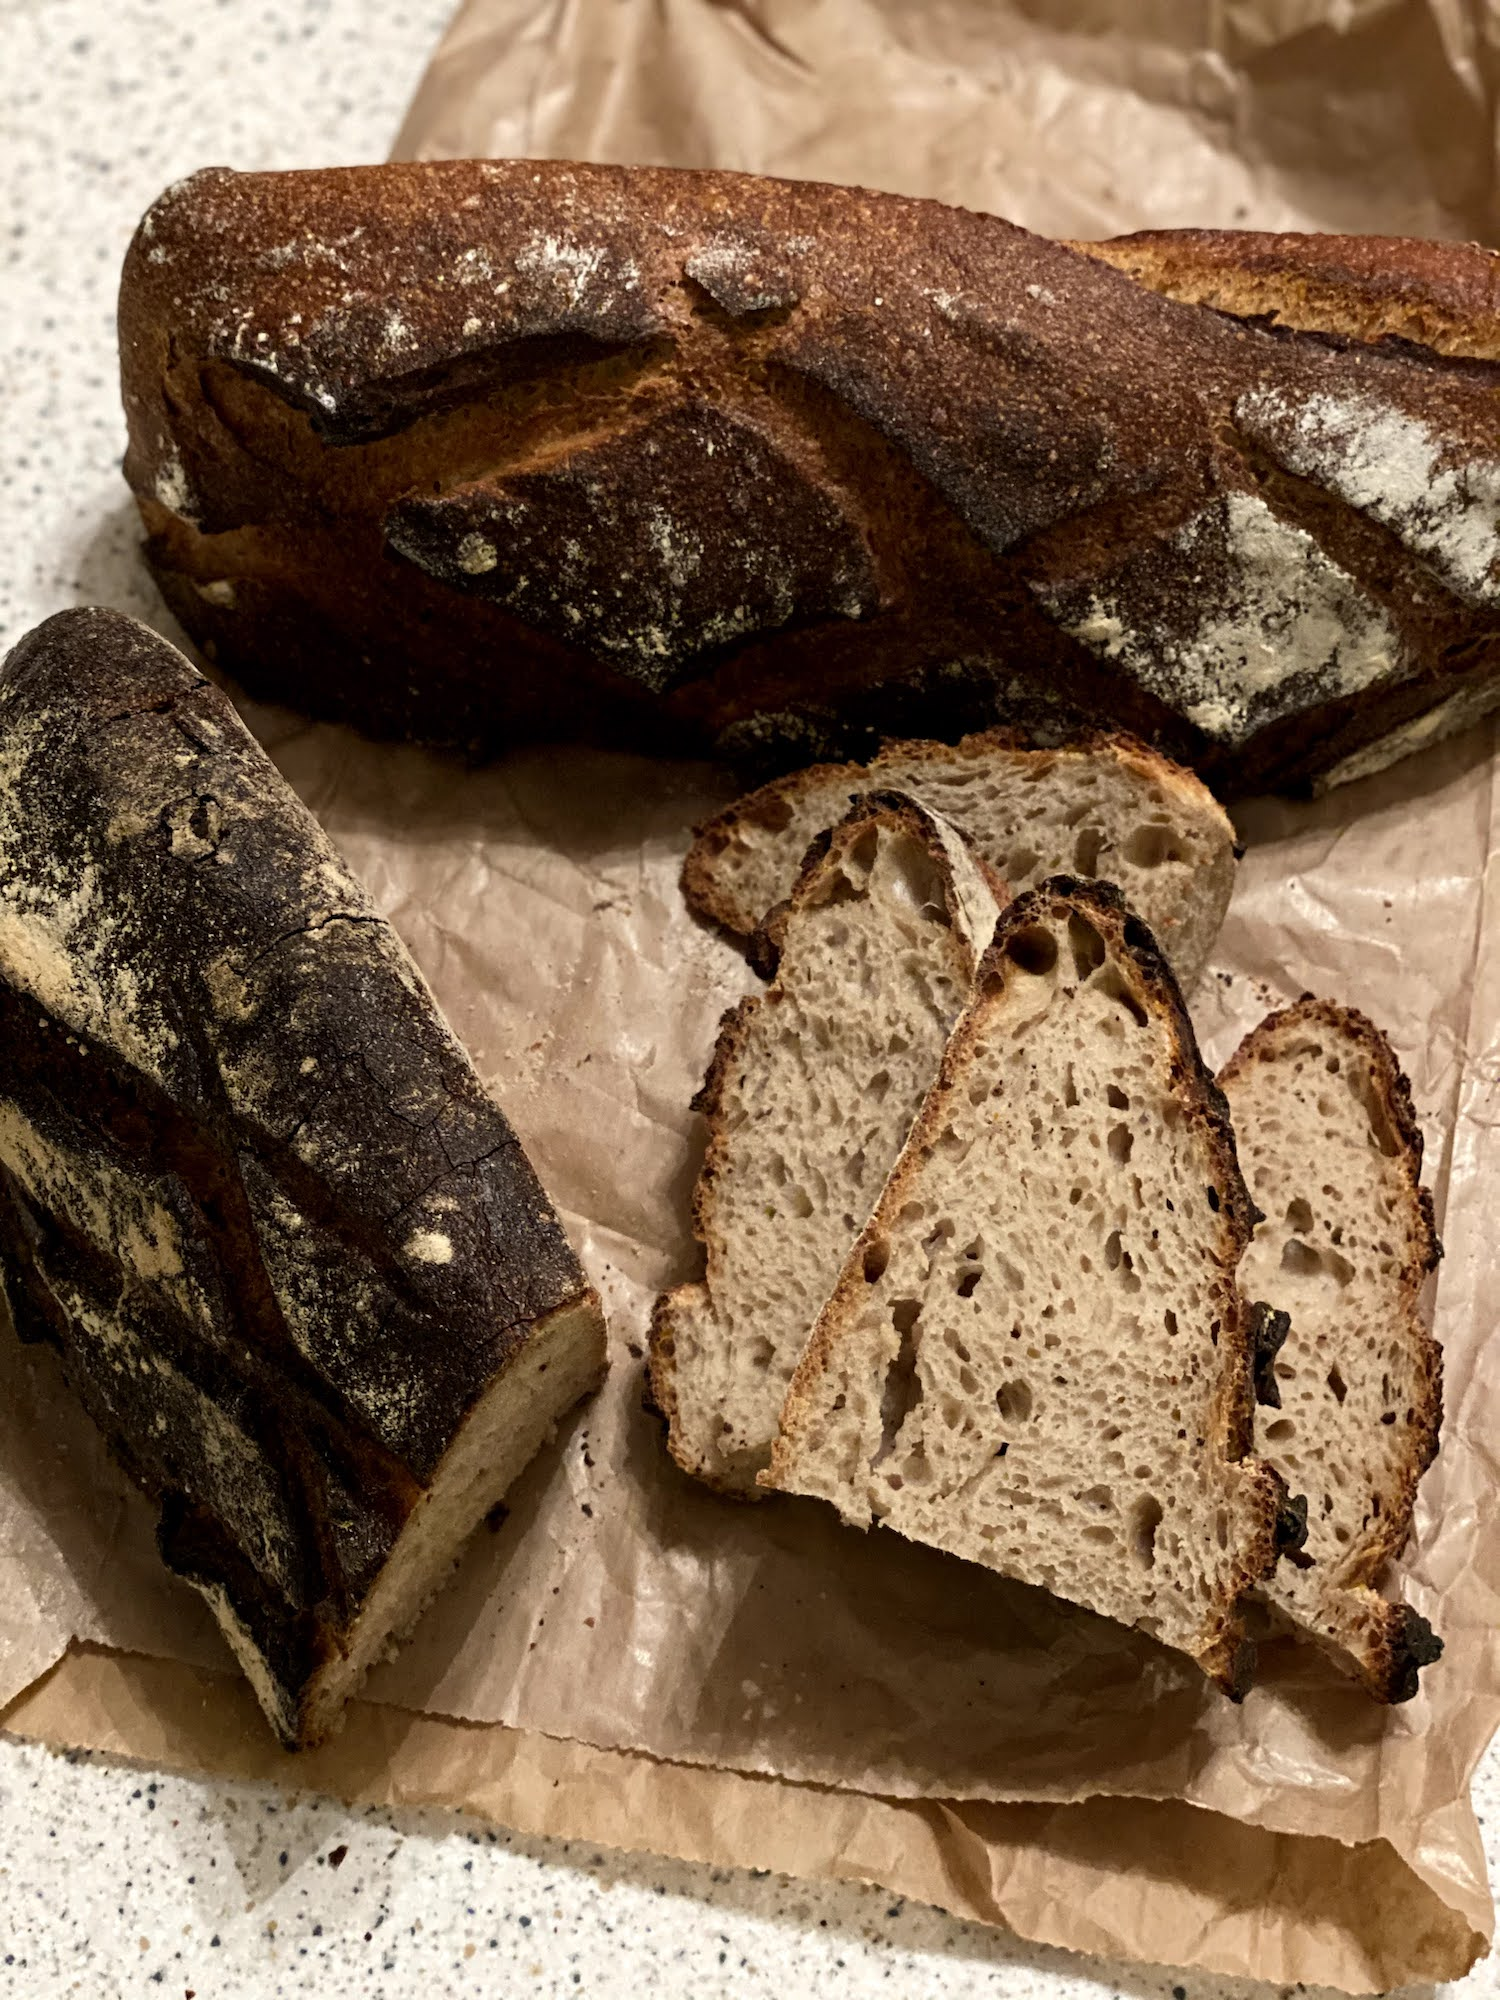 img_7972_kenyer_bread_jokuti_vilagevo.jpg